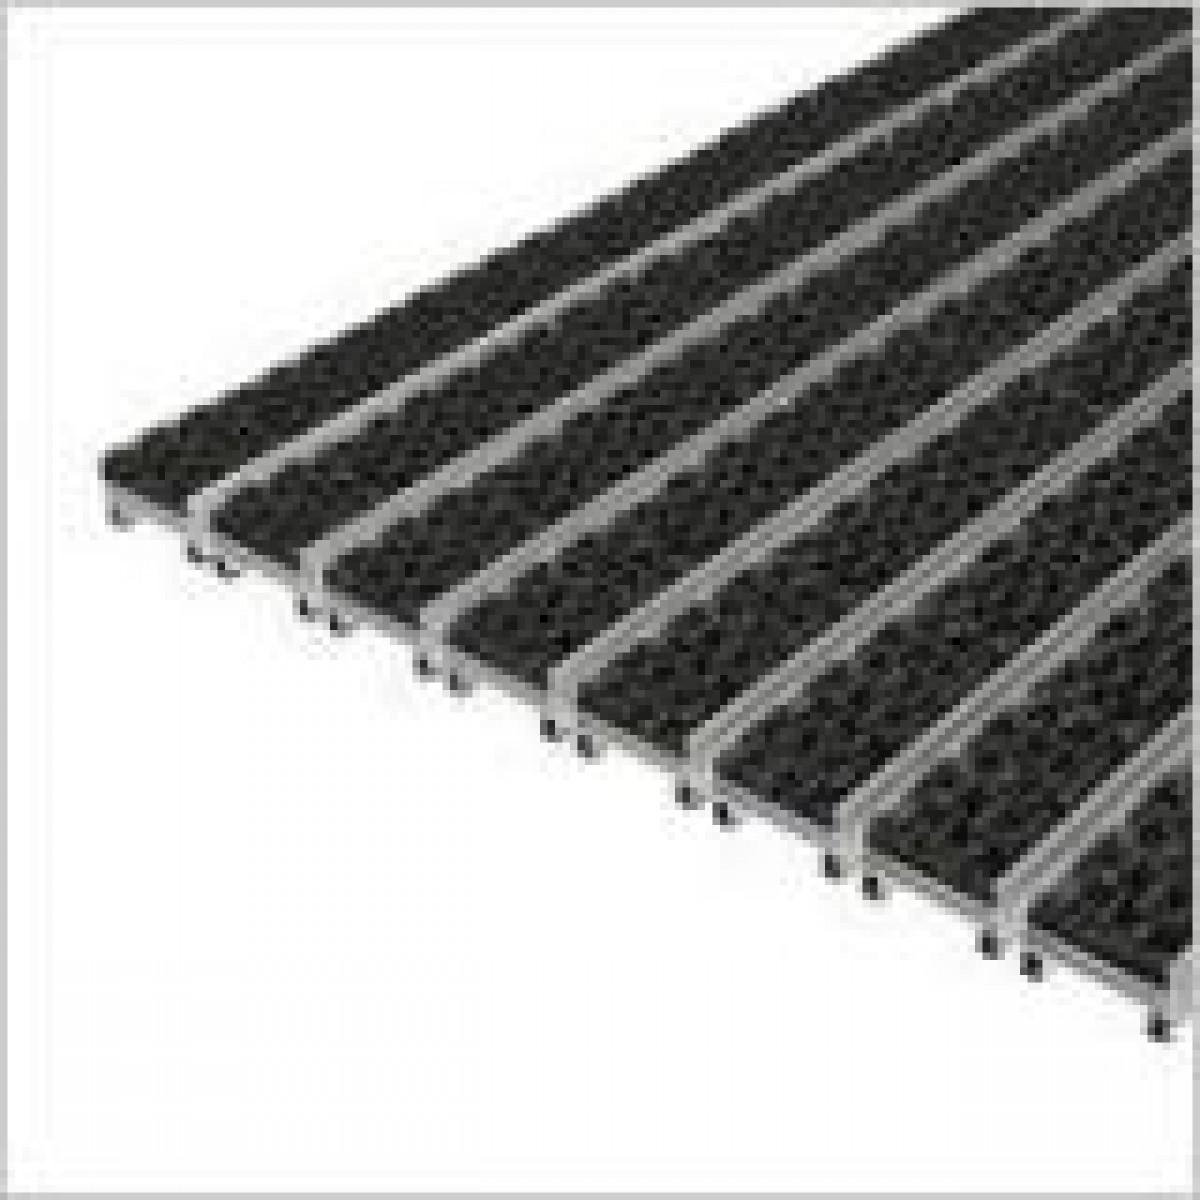 tapis d 39 entr e top clean trend xl green motion geggus. Black Bedroom Furniture Sets. Home Design Ideas